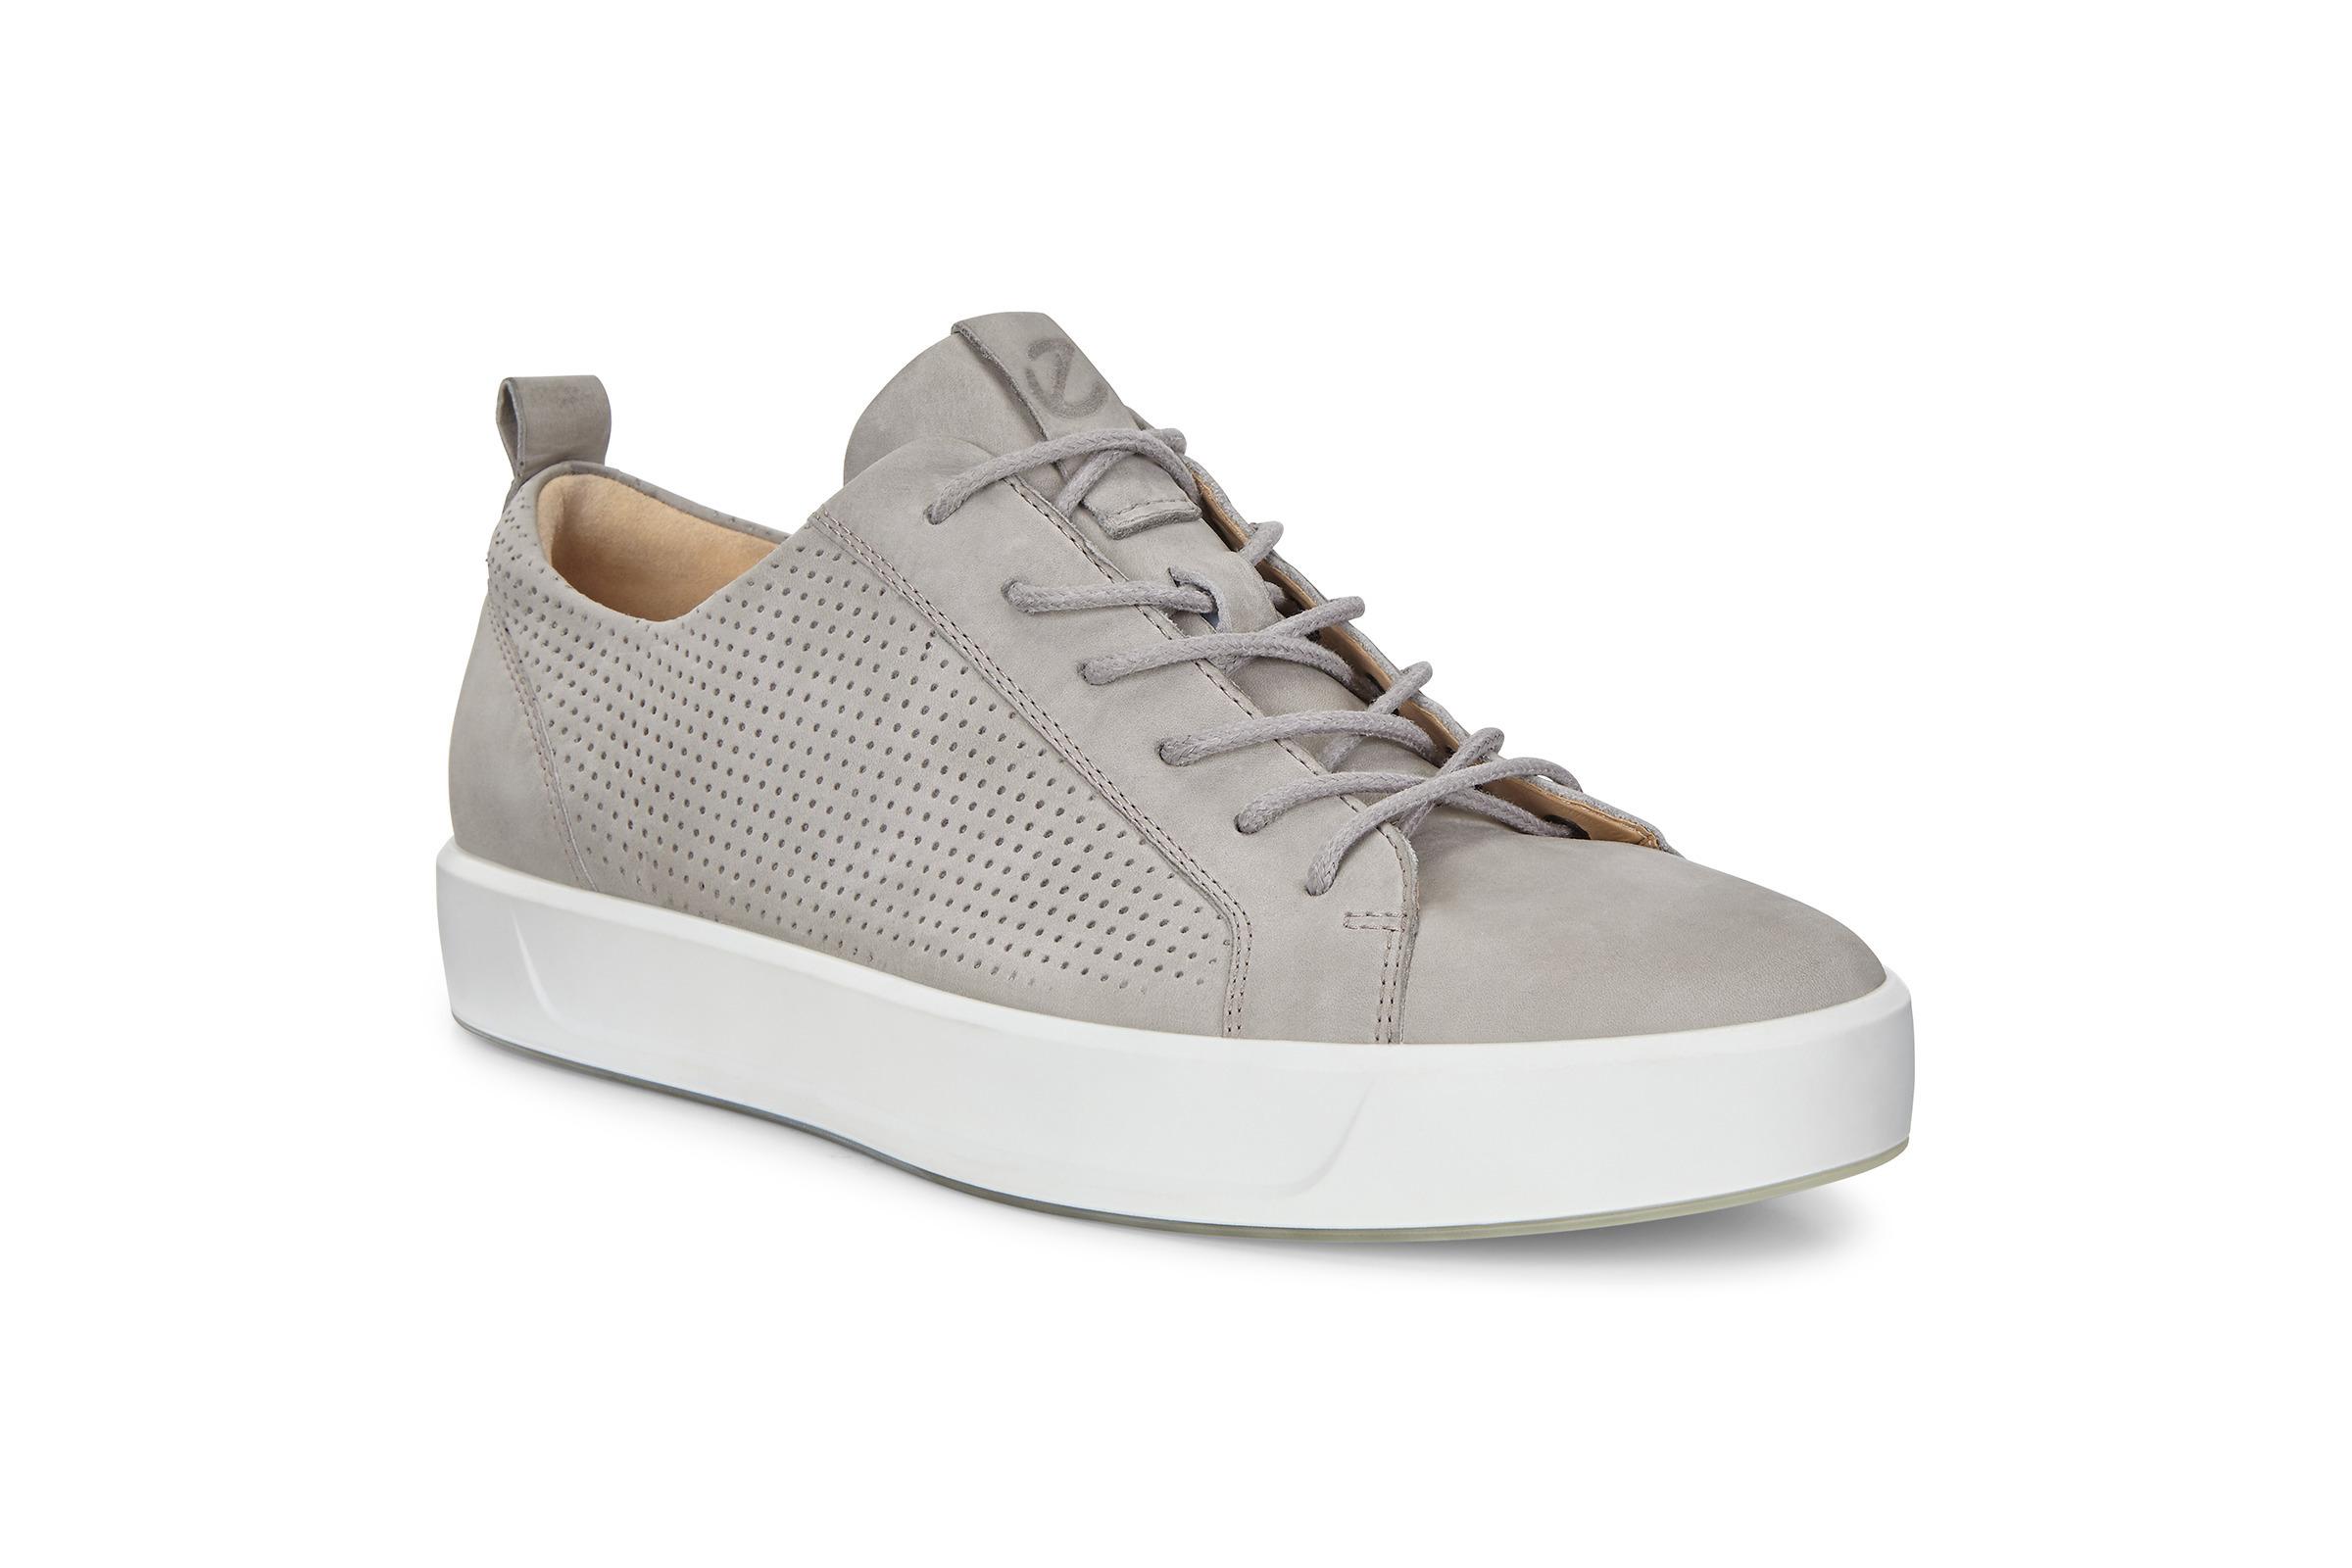 ECCO Soft 8 M Shoe Sneakers Size 5-5.5 Moon Rock